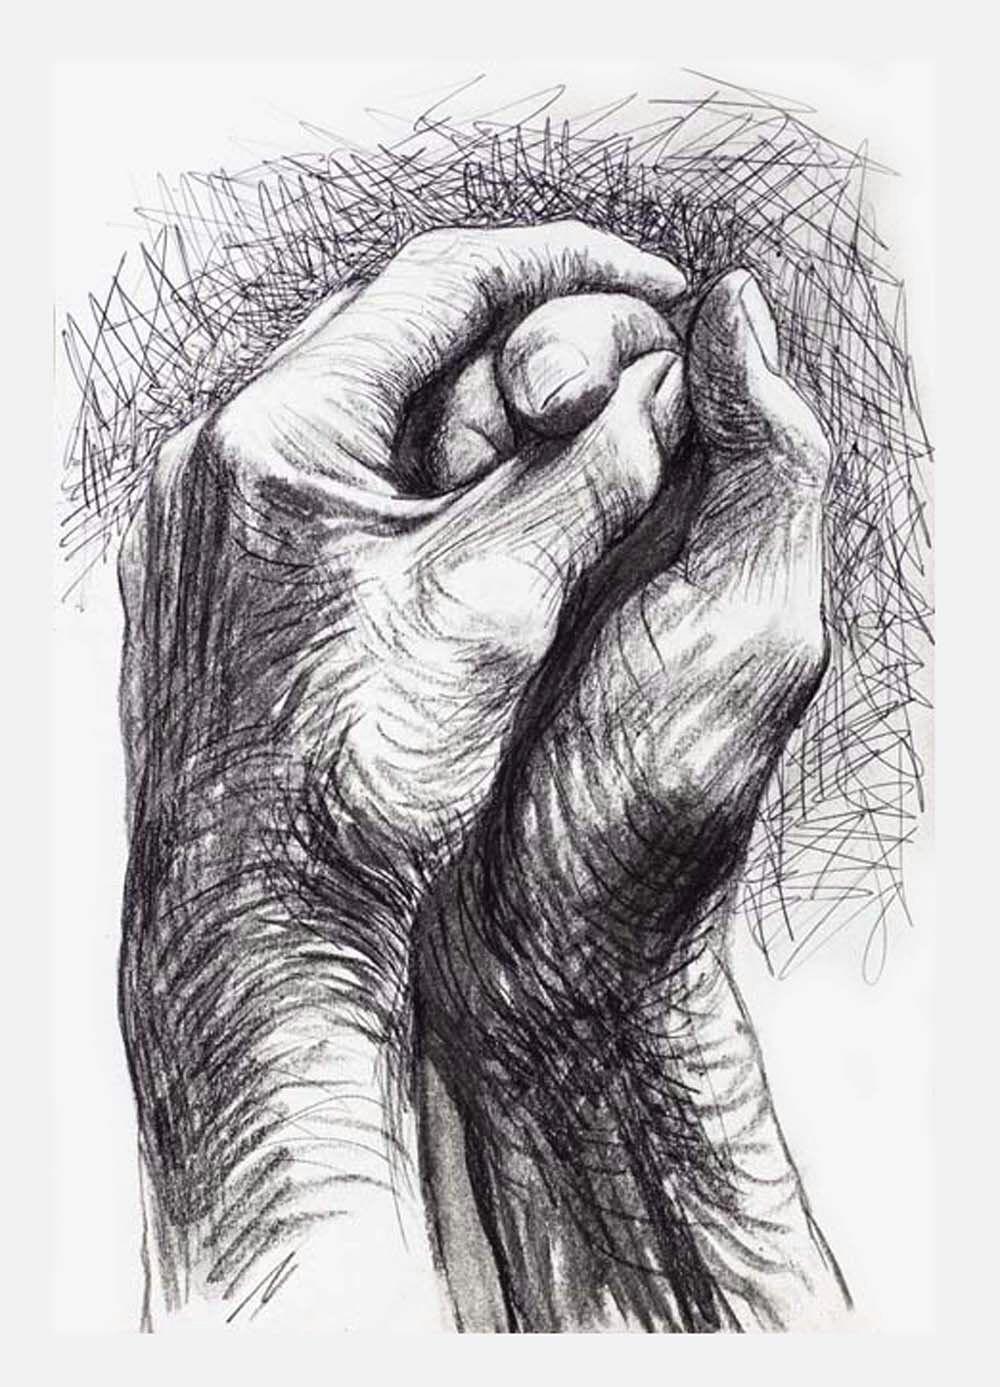 art sketches art drawings drawings of hands drawing hands pen sketch